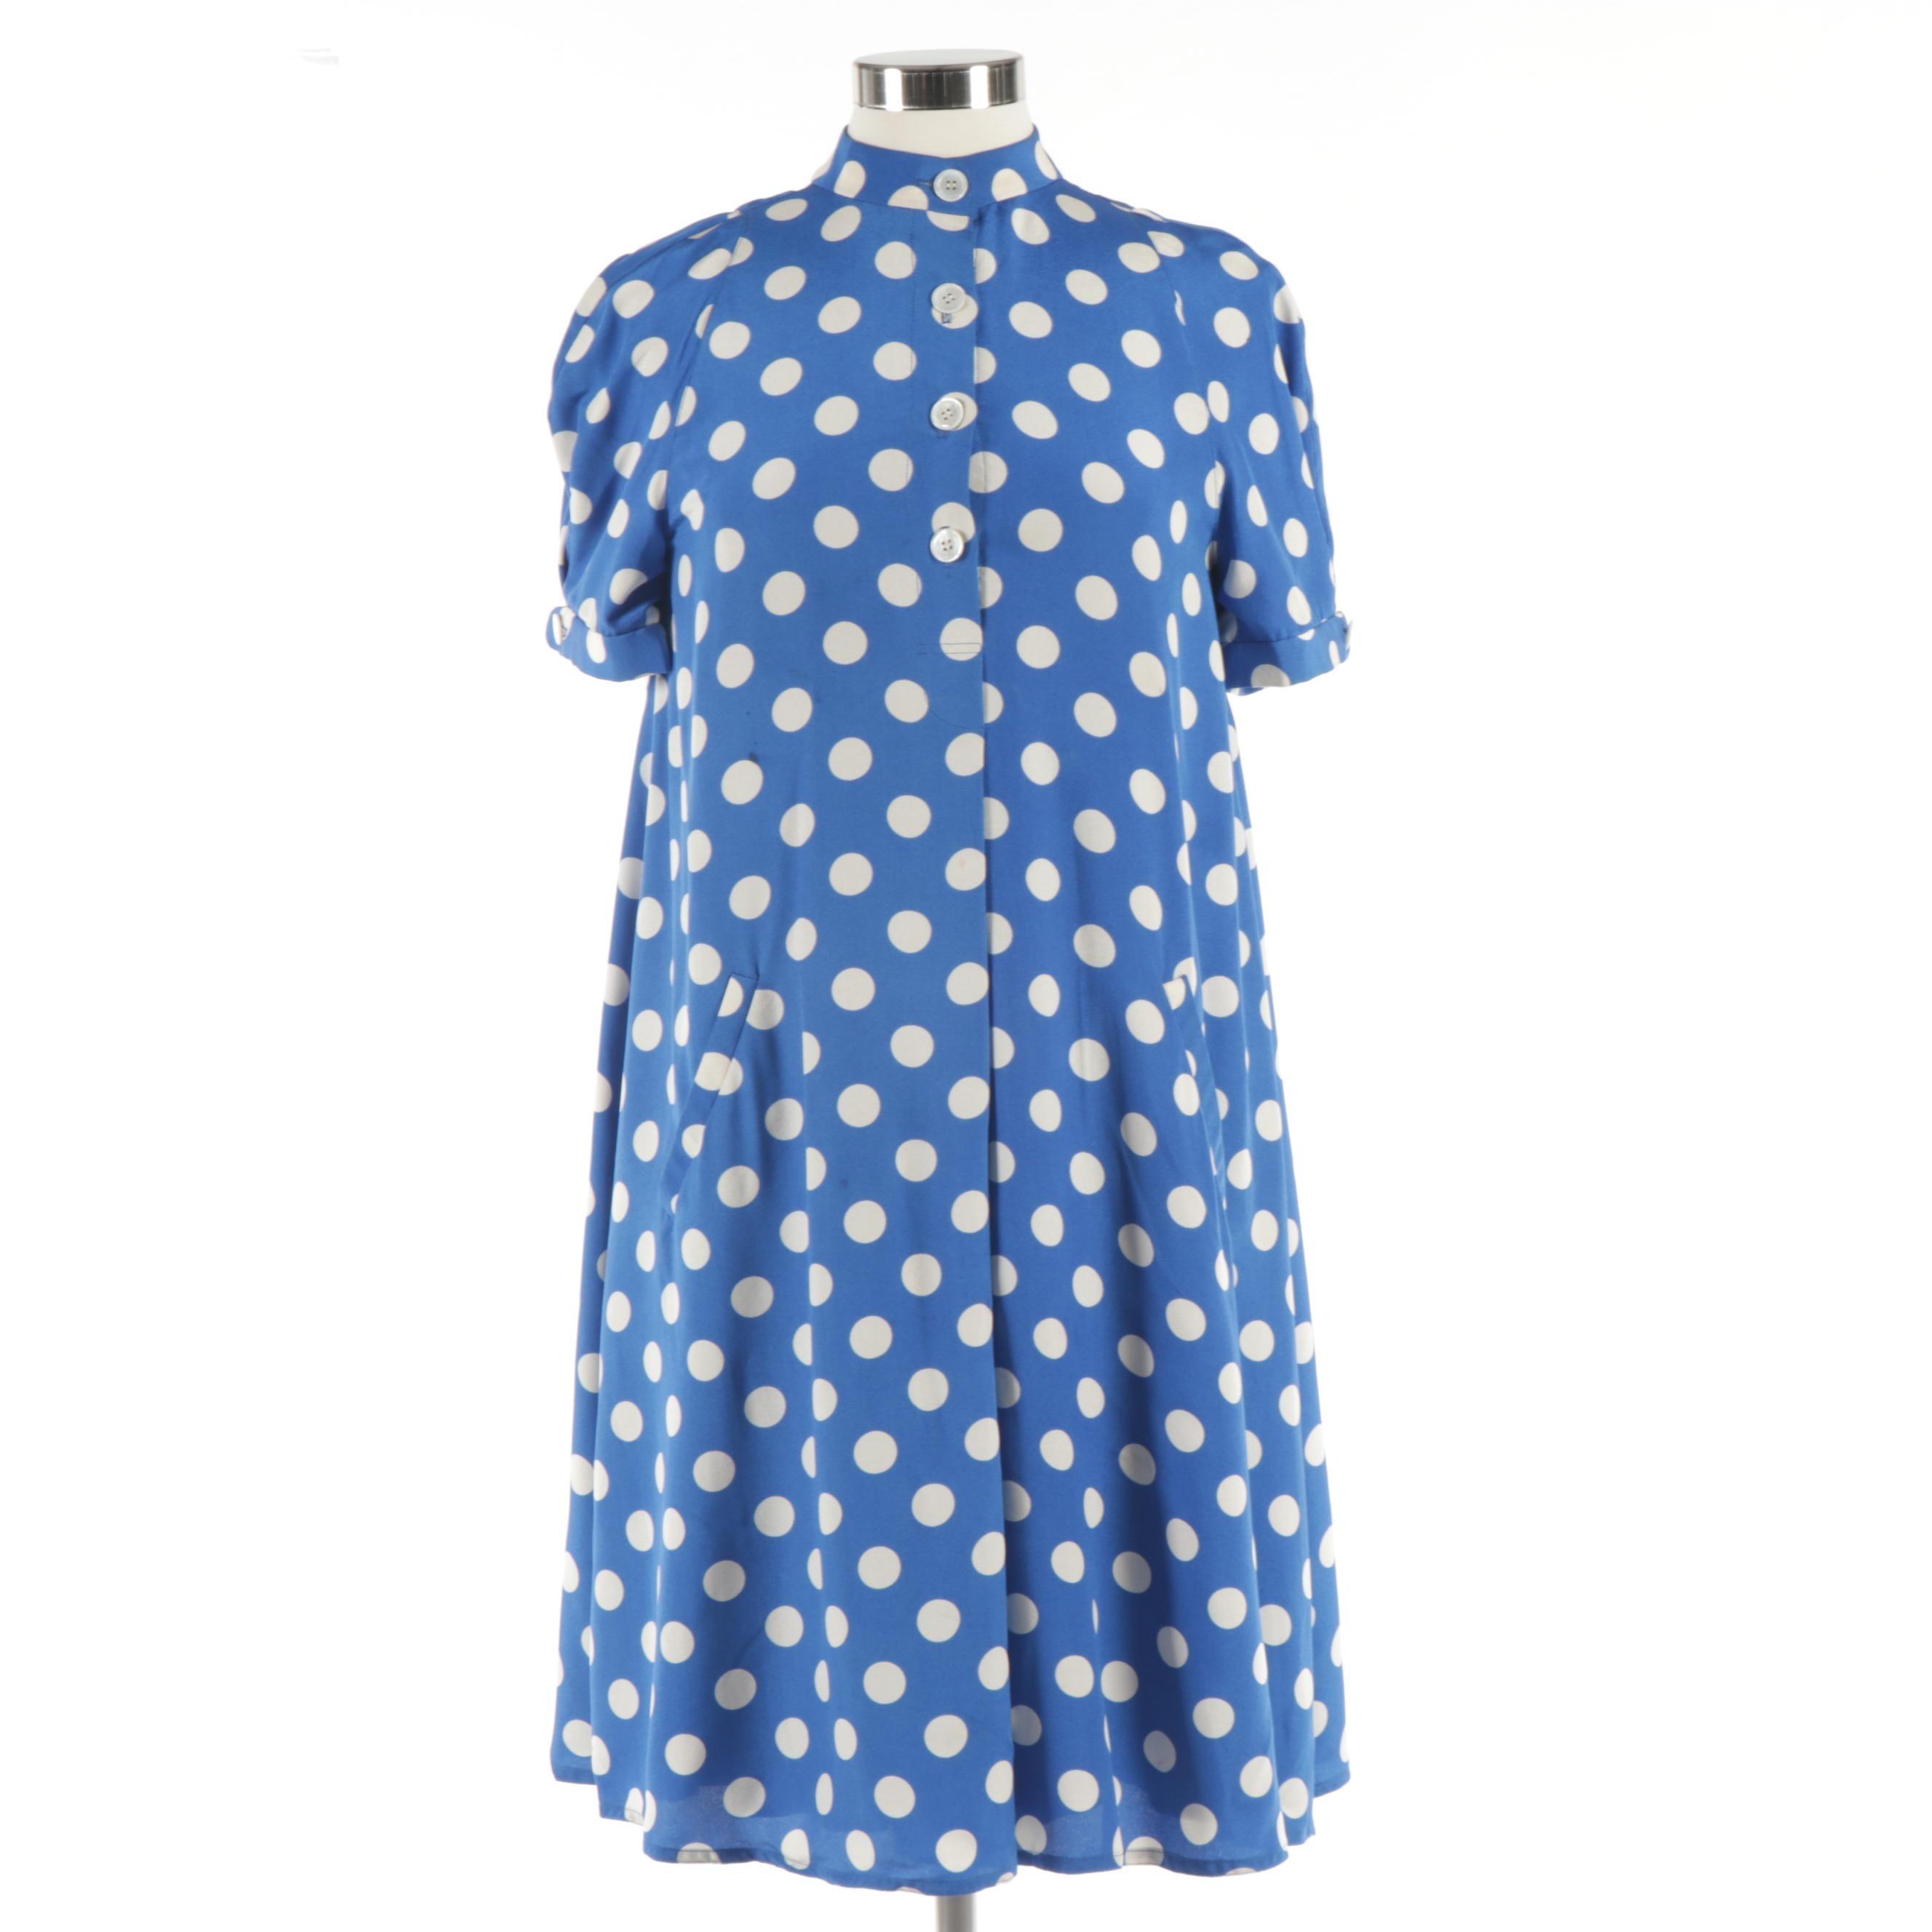 Geoffrey Beene New York Blue and White Polka Dot Swing Dress, 1980s Vintage